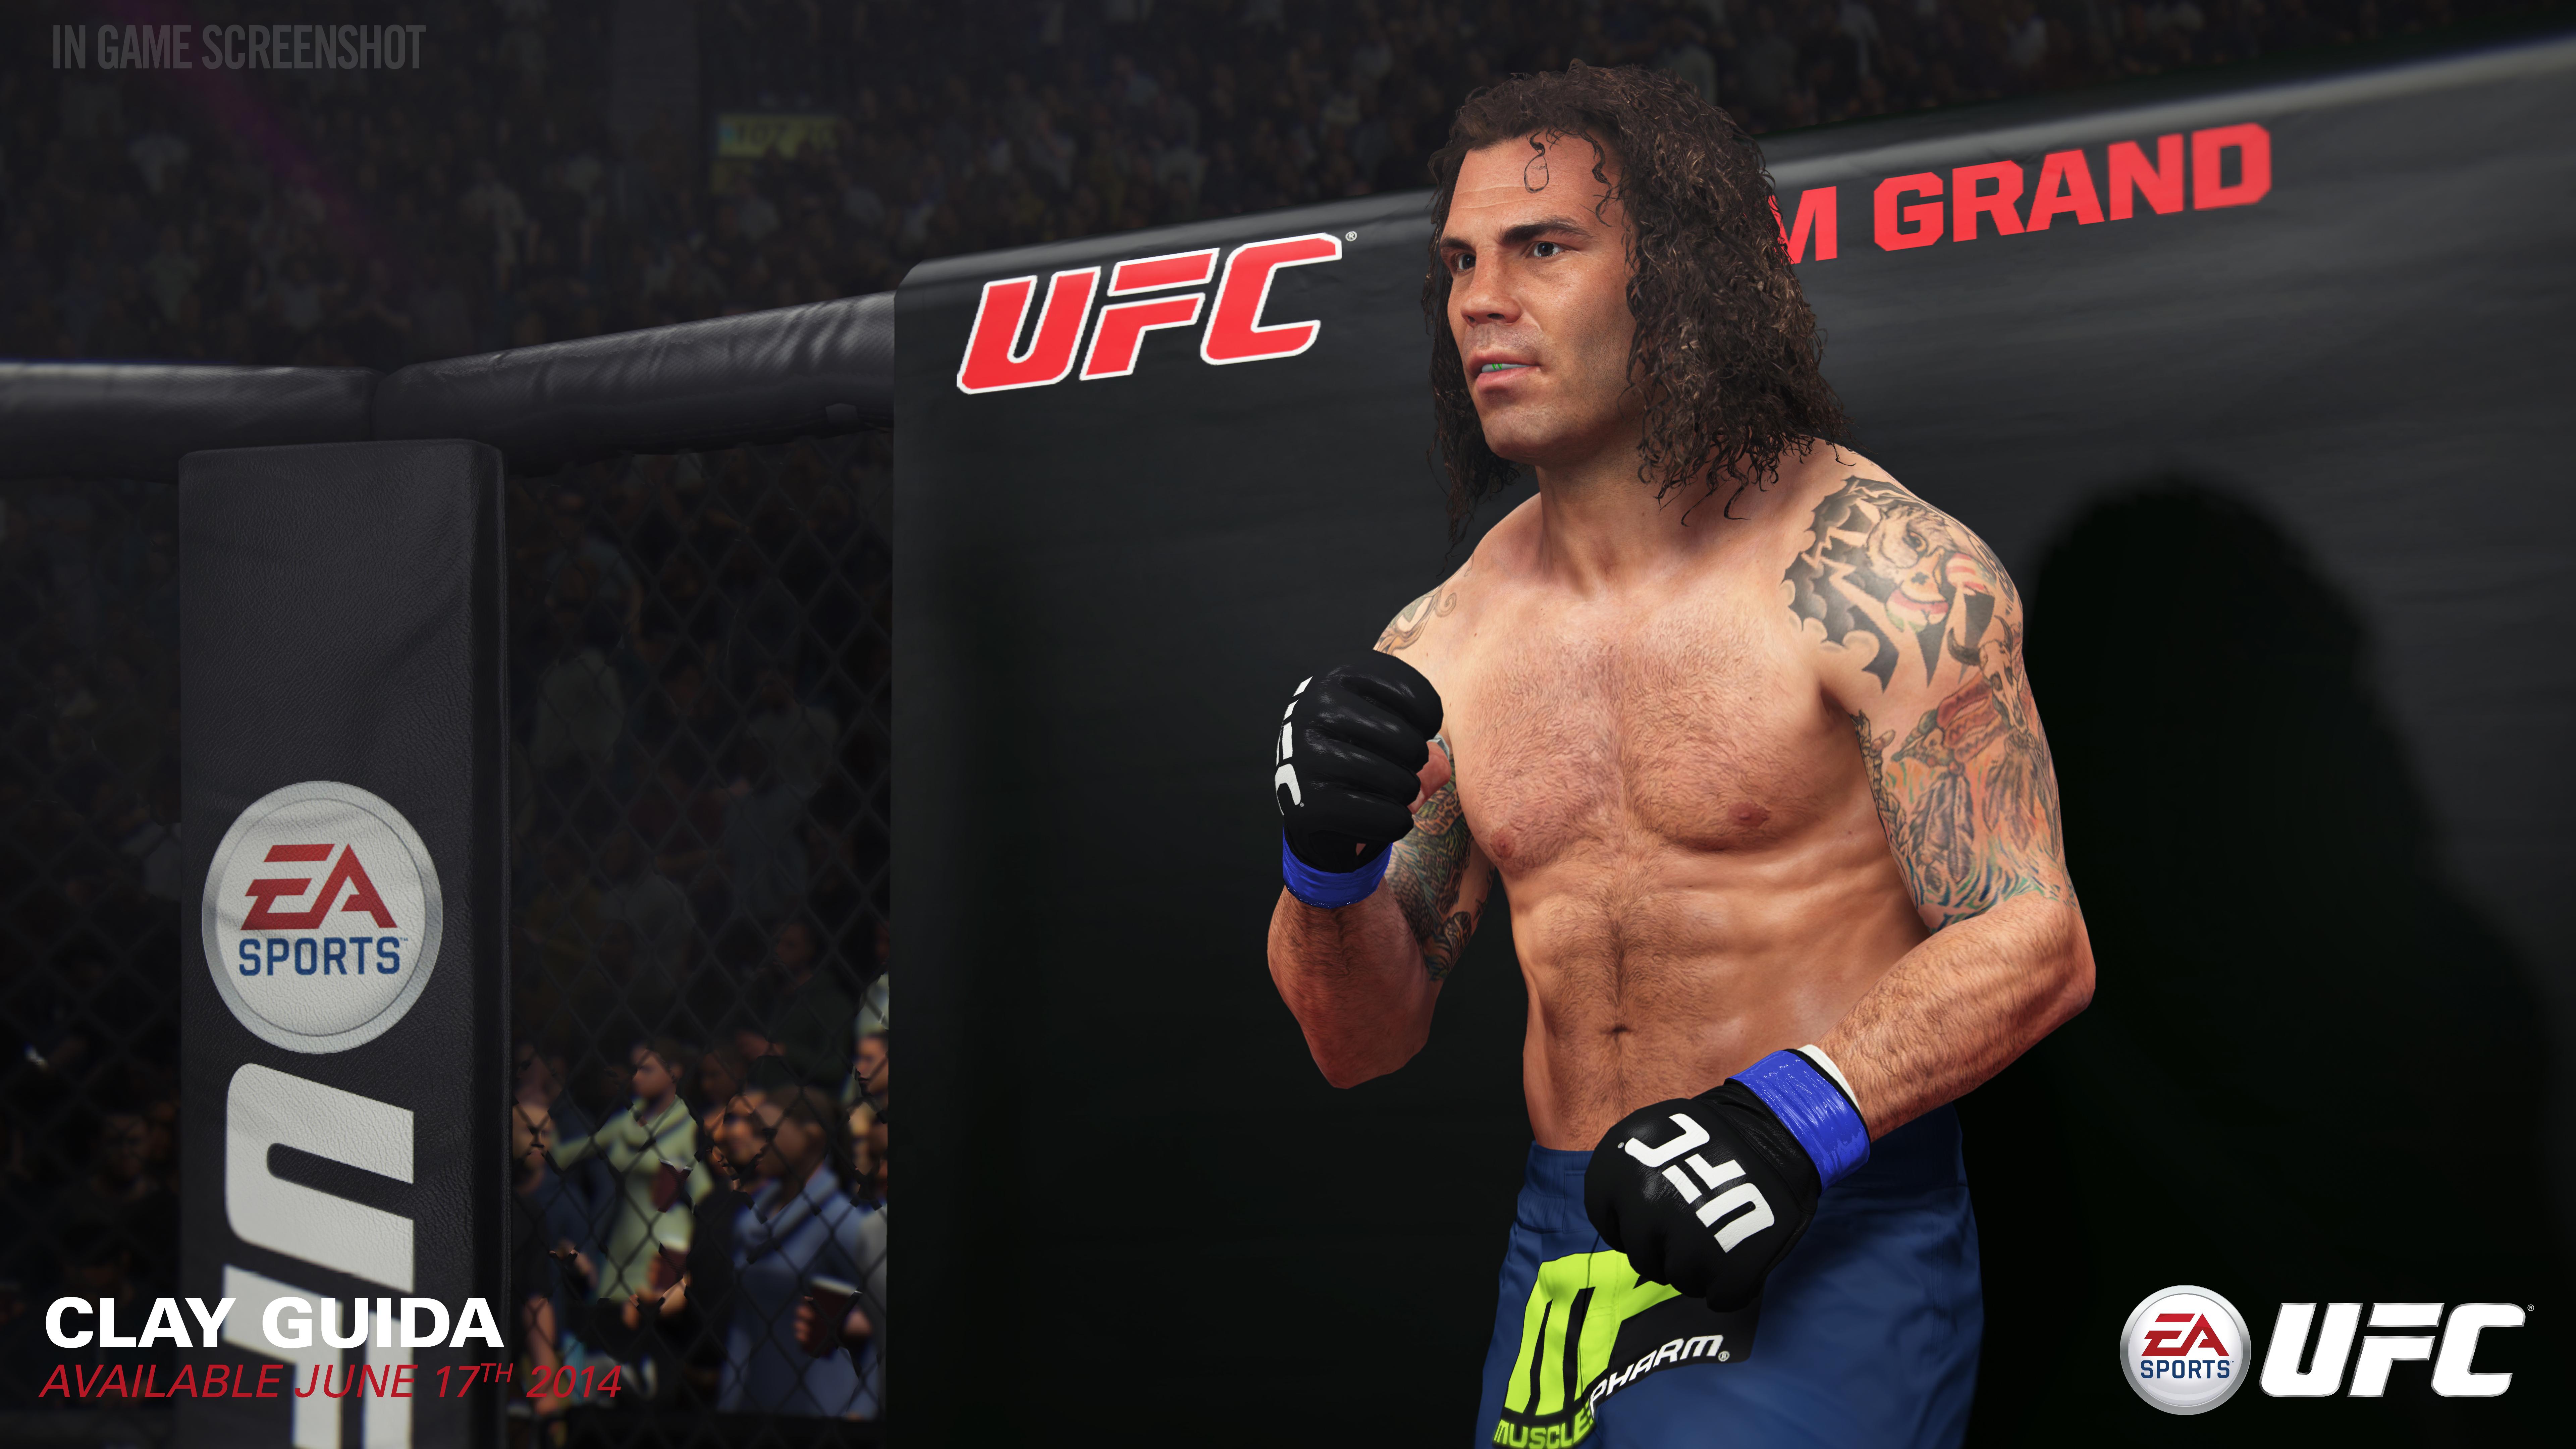 Клэй Гуида - EA Sports UFC 8K